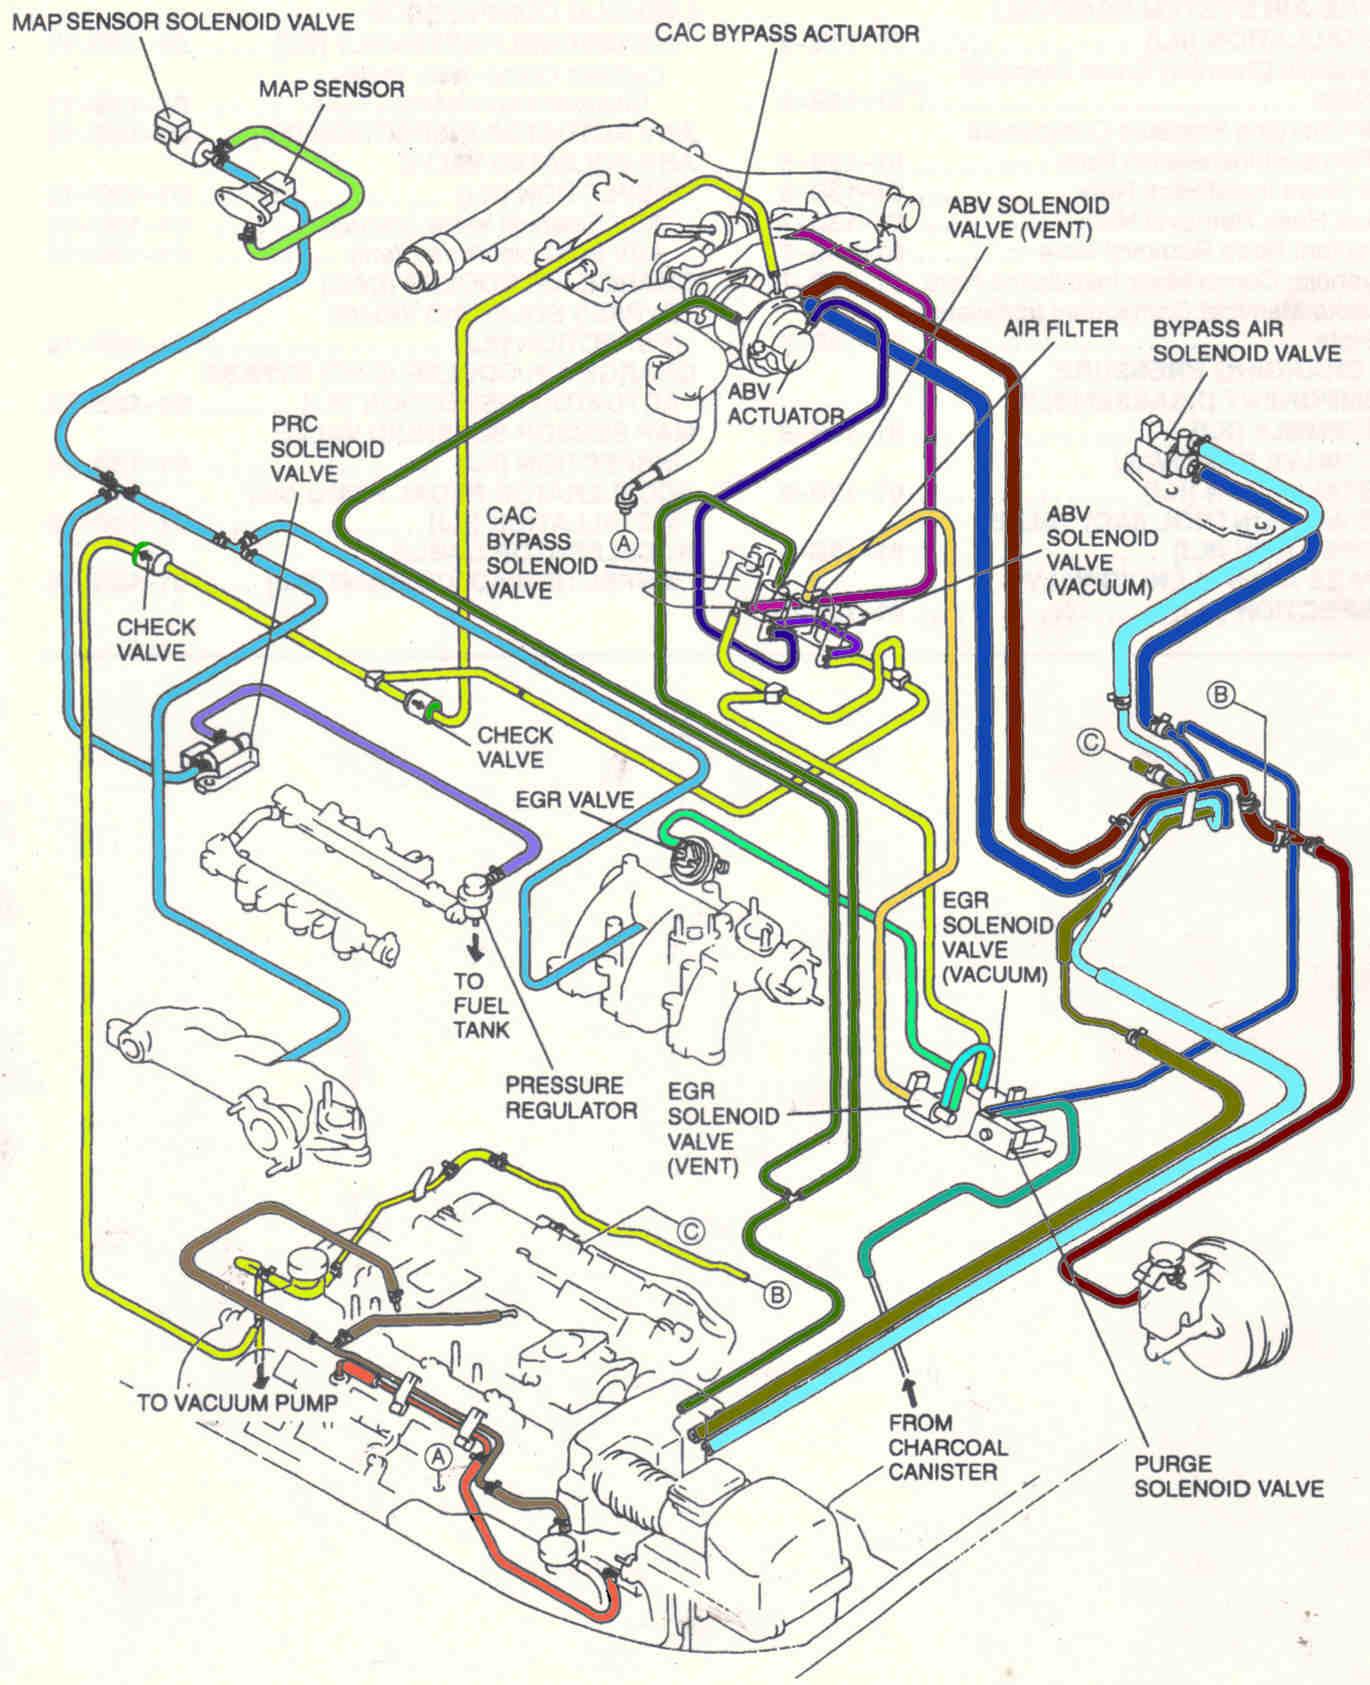 96up kj vachose?resize\\\\\\\=665%2C818 panasonic cn nvd905u wiring diagram wiring diagrams panasonic cn-nvd905u wiring harness at panicattacktreatment.co